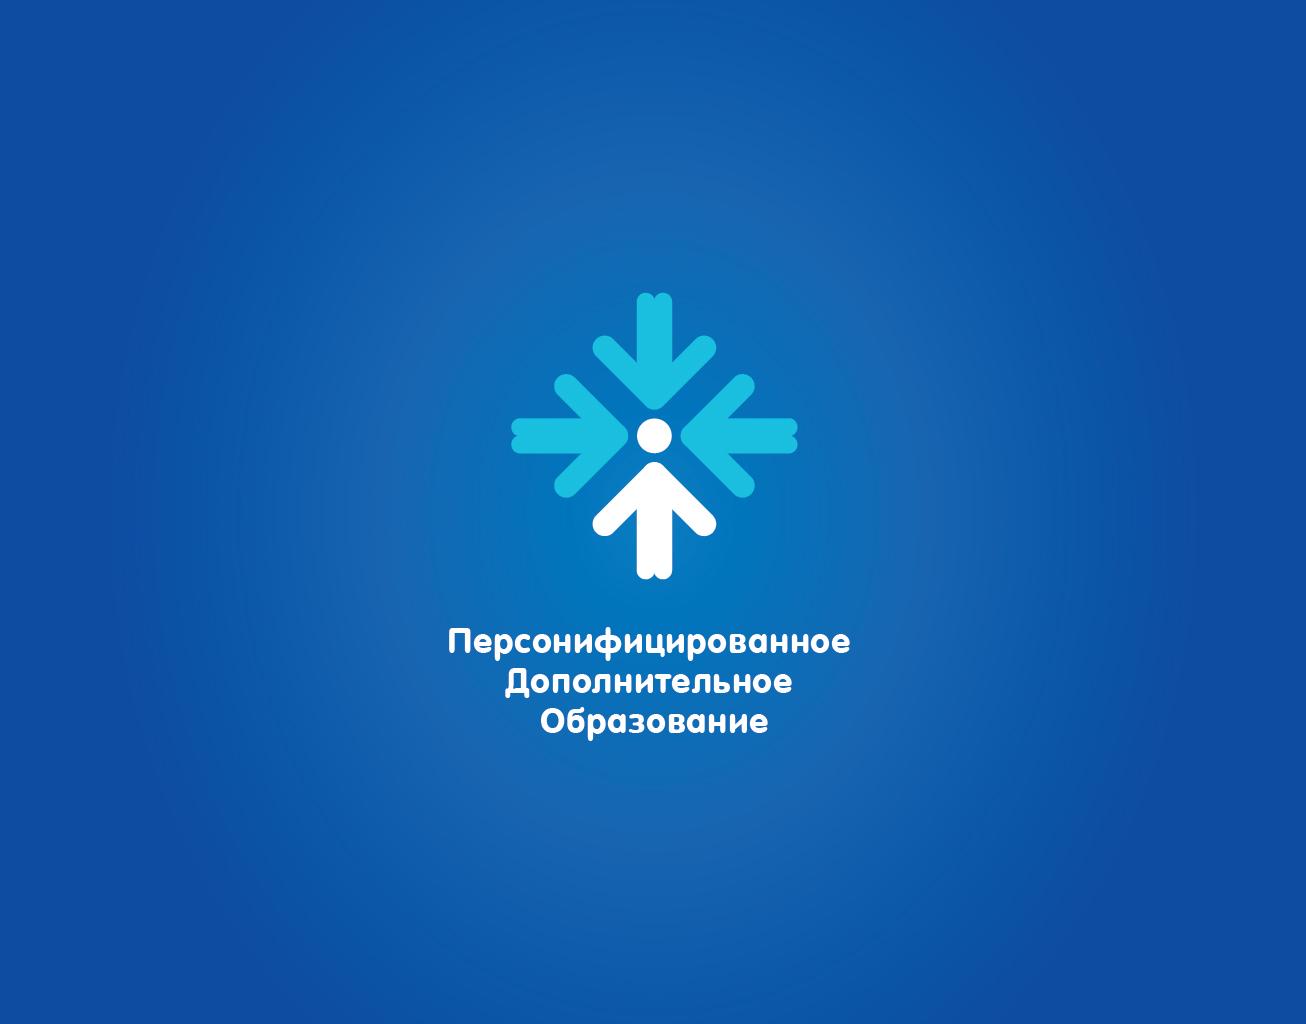 Логотип для интернет-портала фото f_9345a4c0fb94d015.jpg